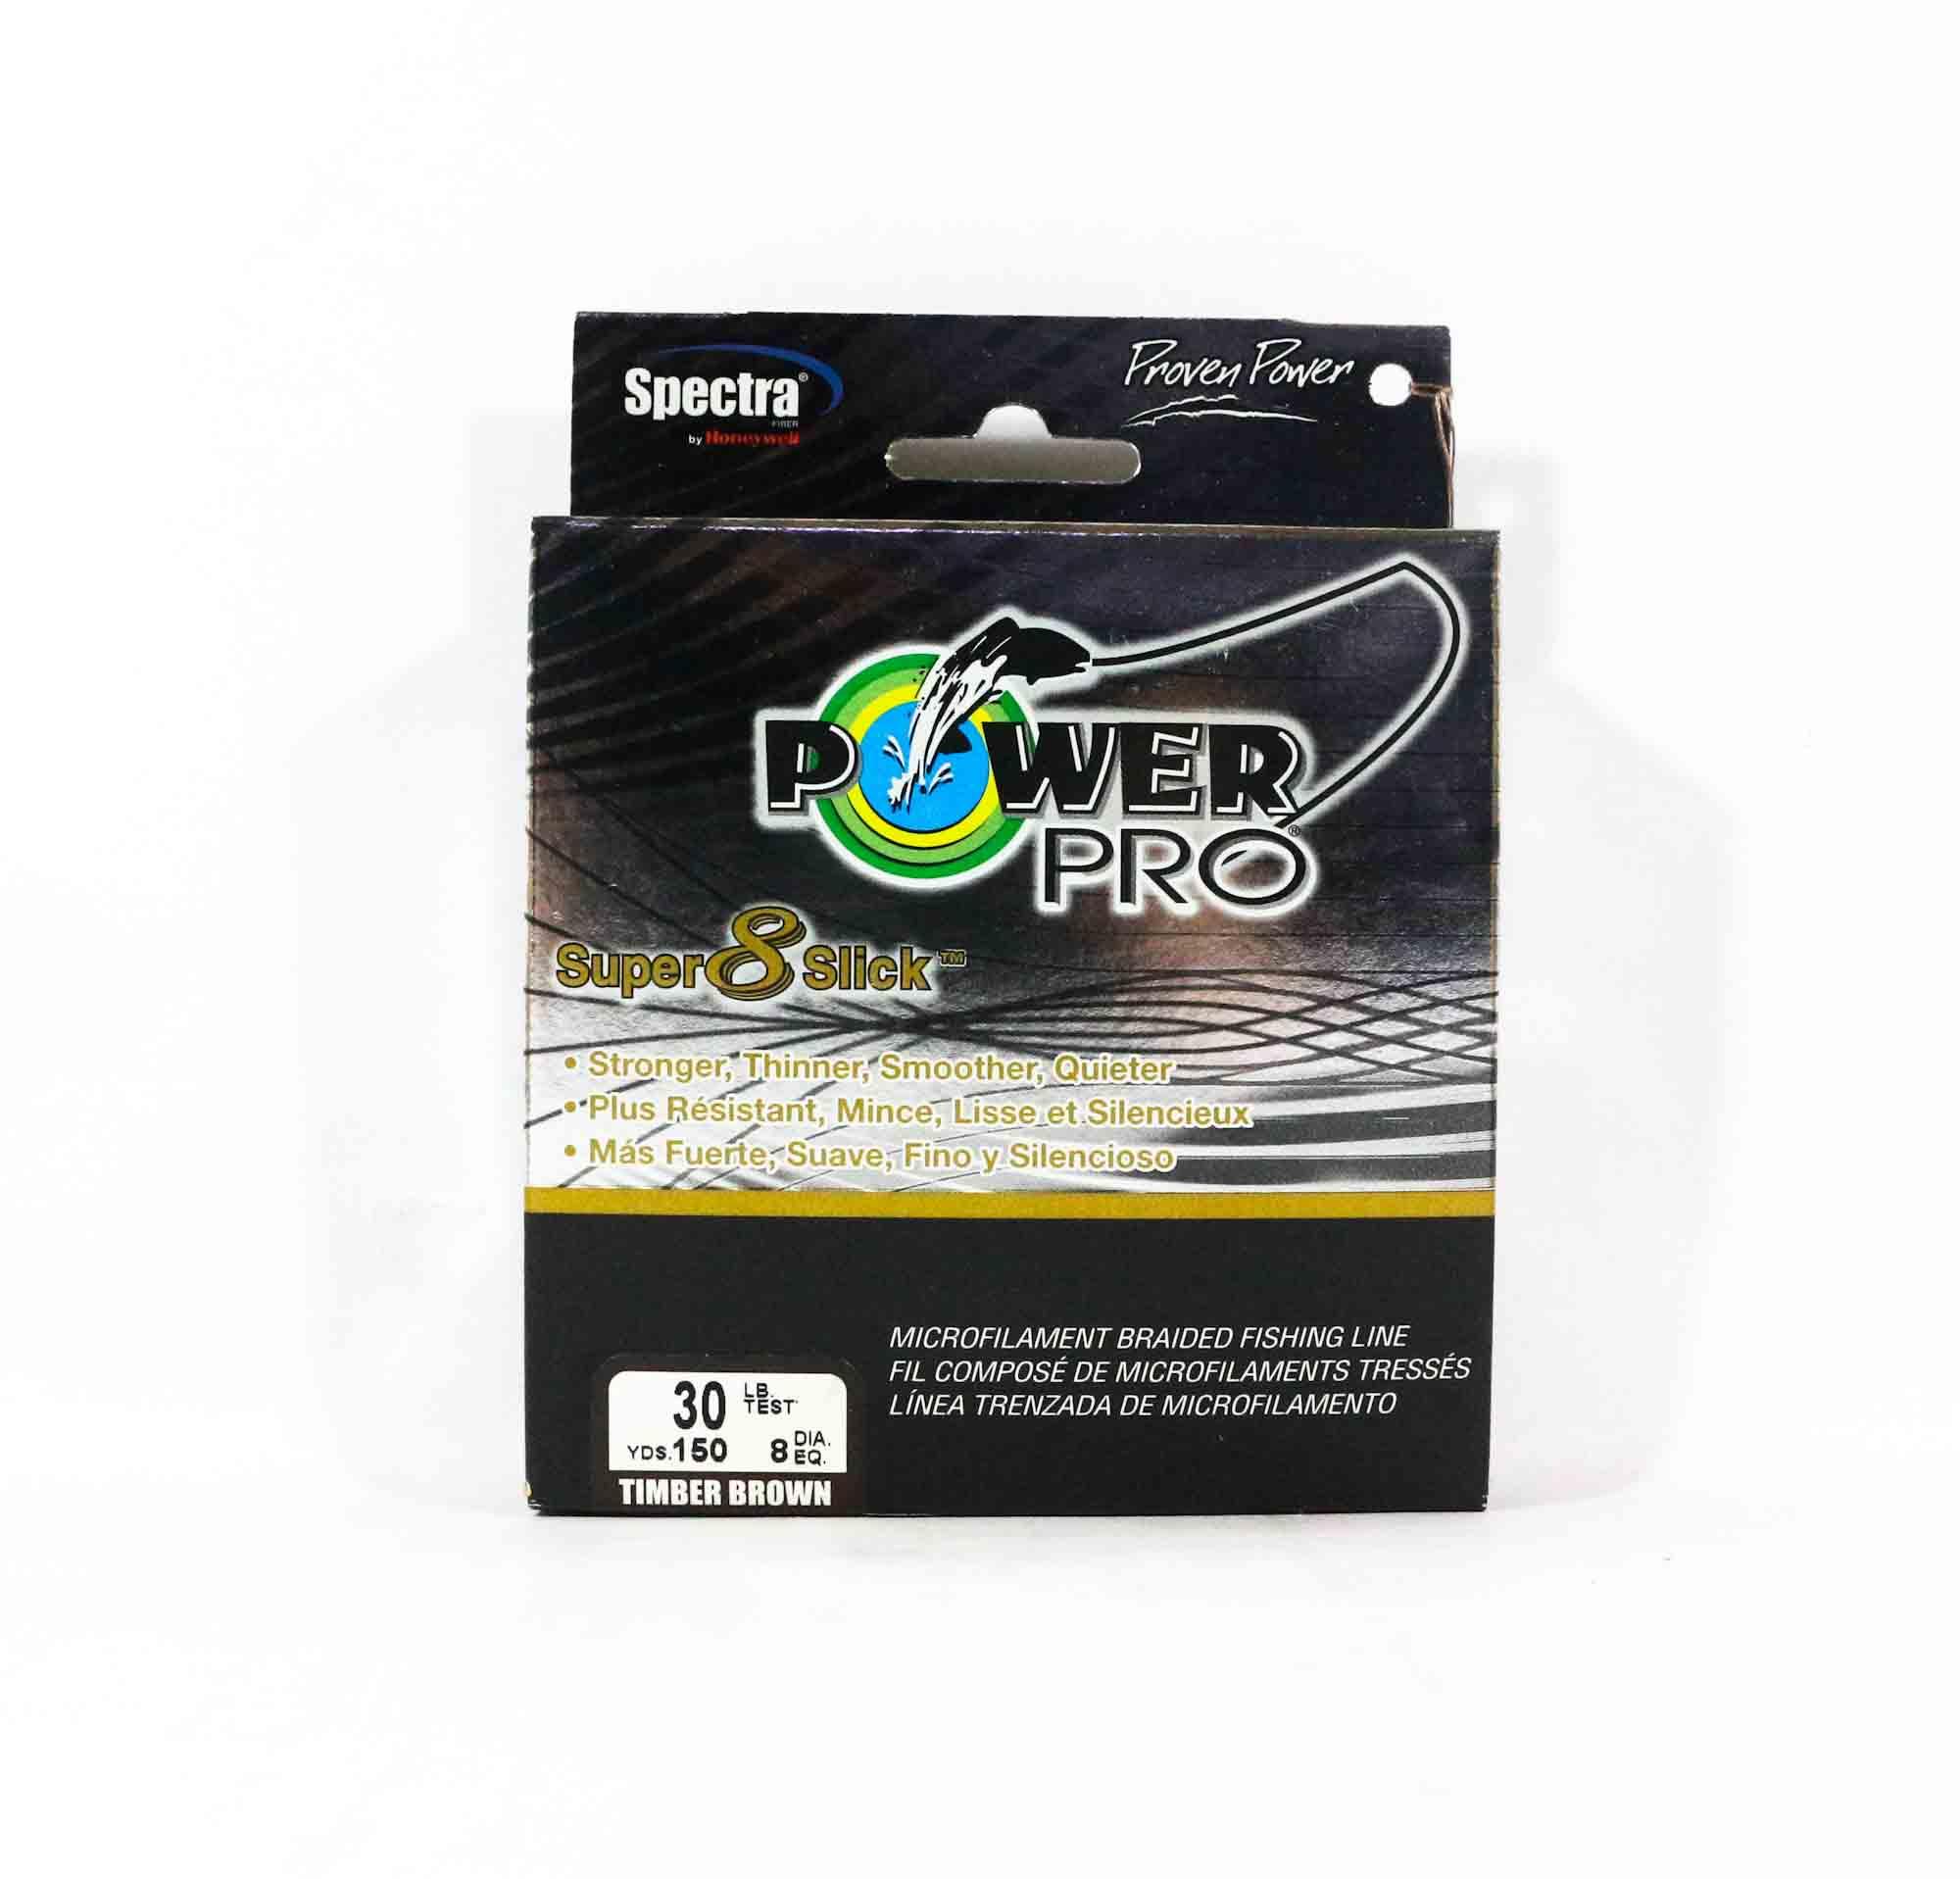 Power Pro Super 8 Slick Spectra Line 30lb by 150yds Brown (0404)